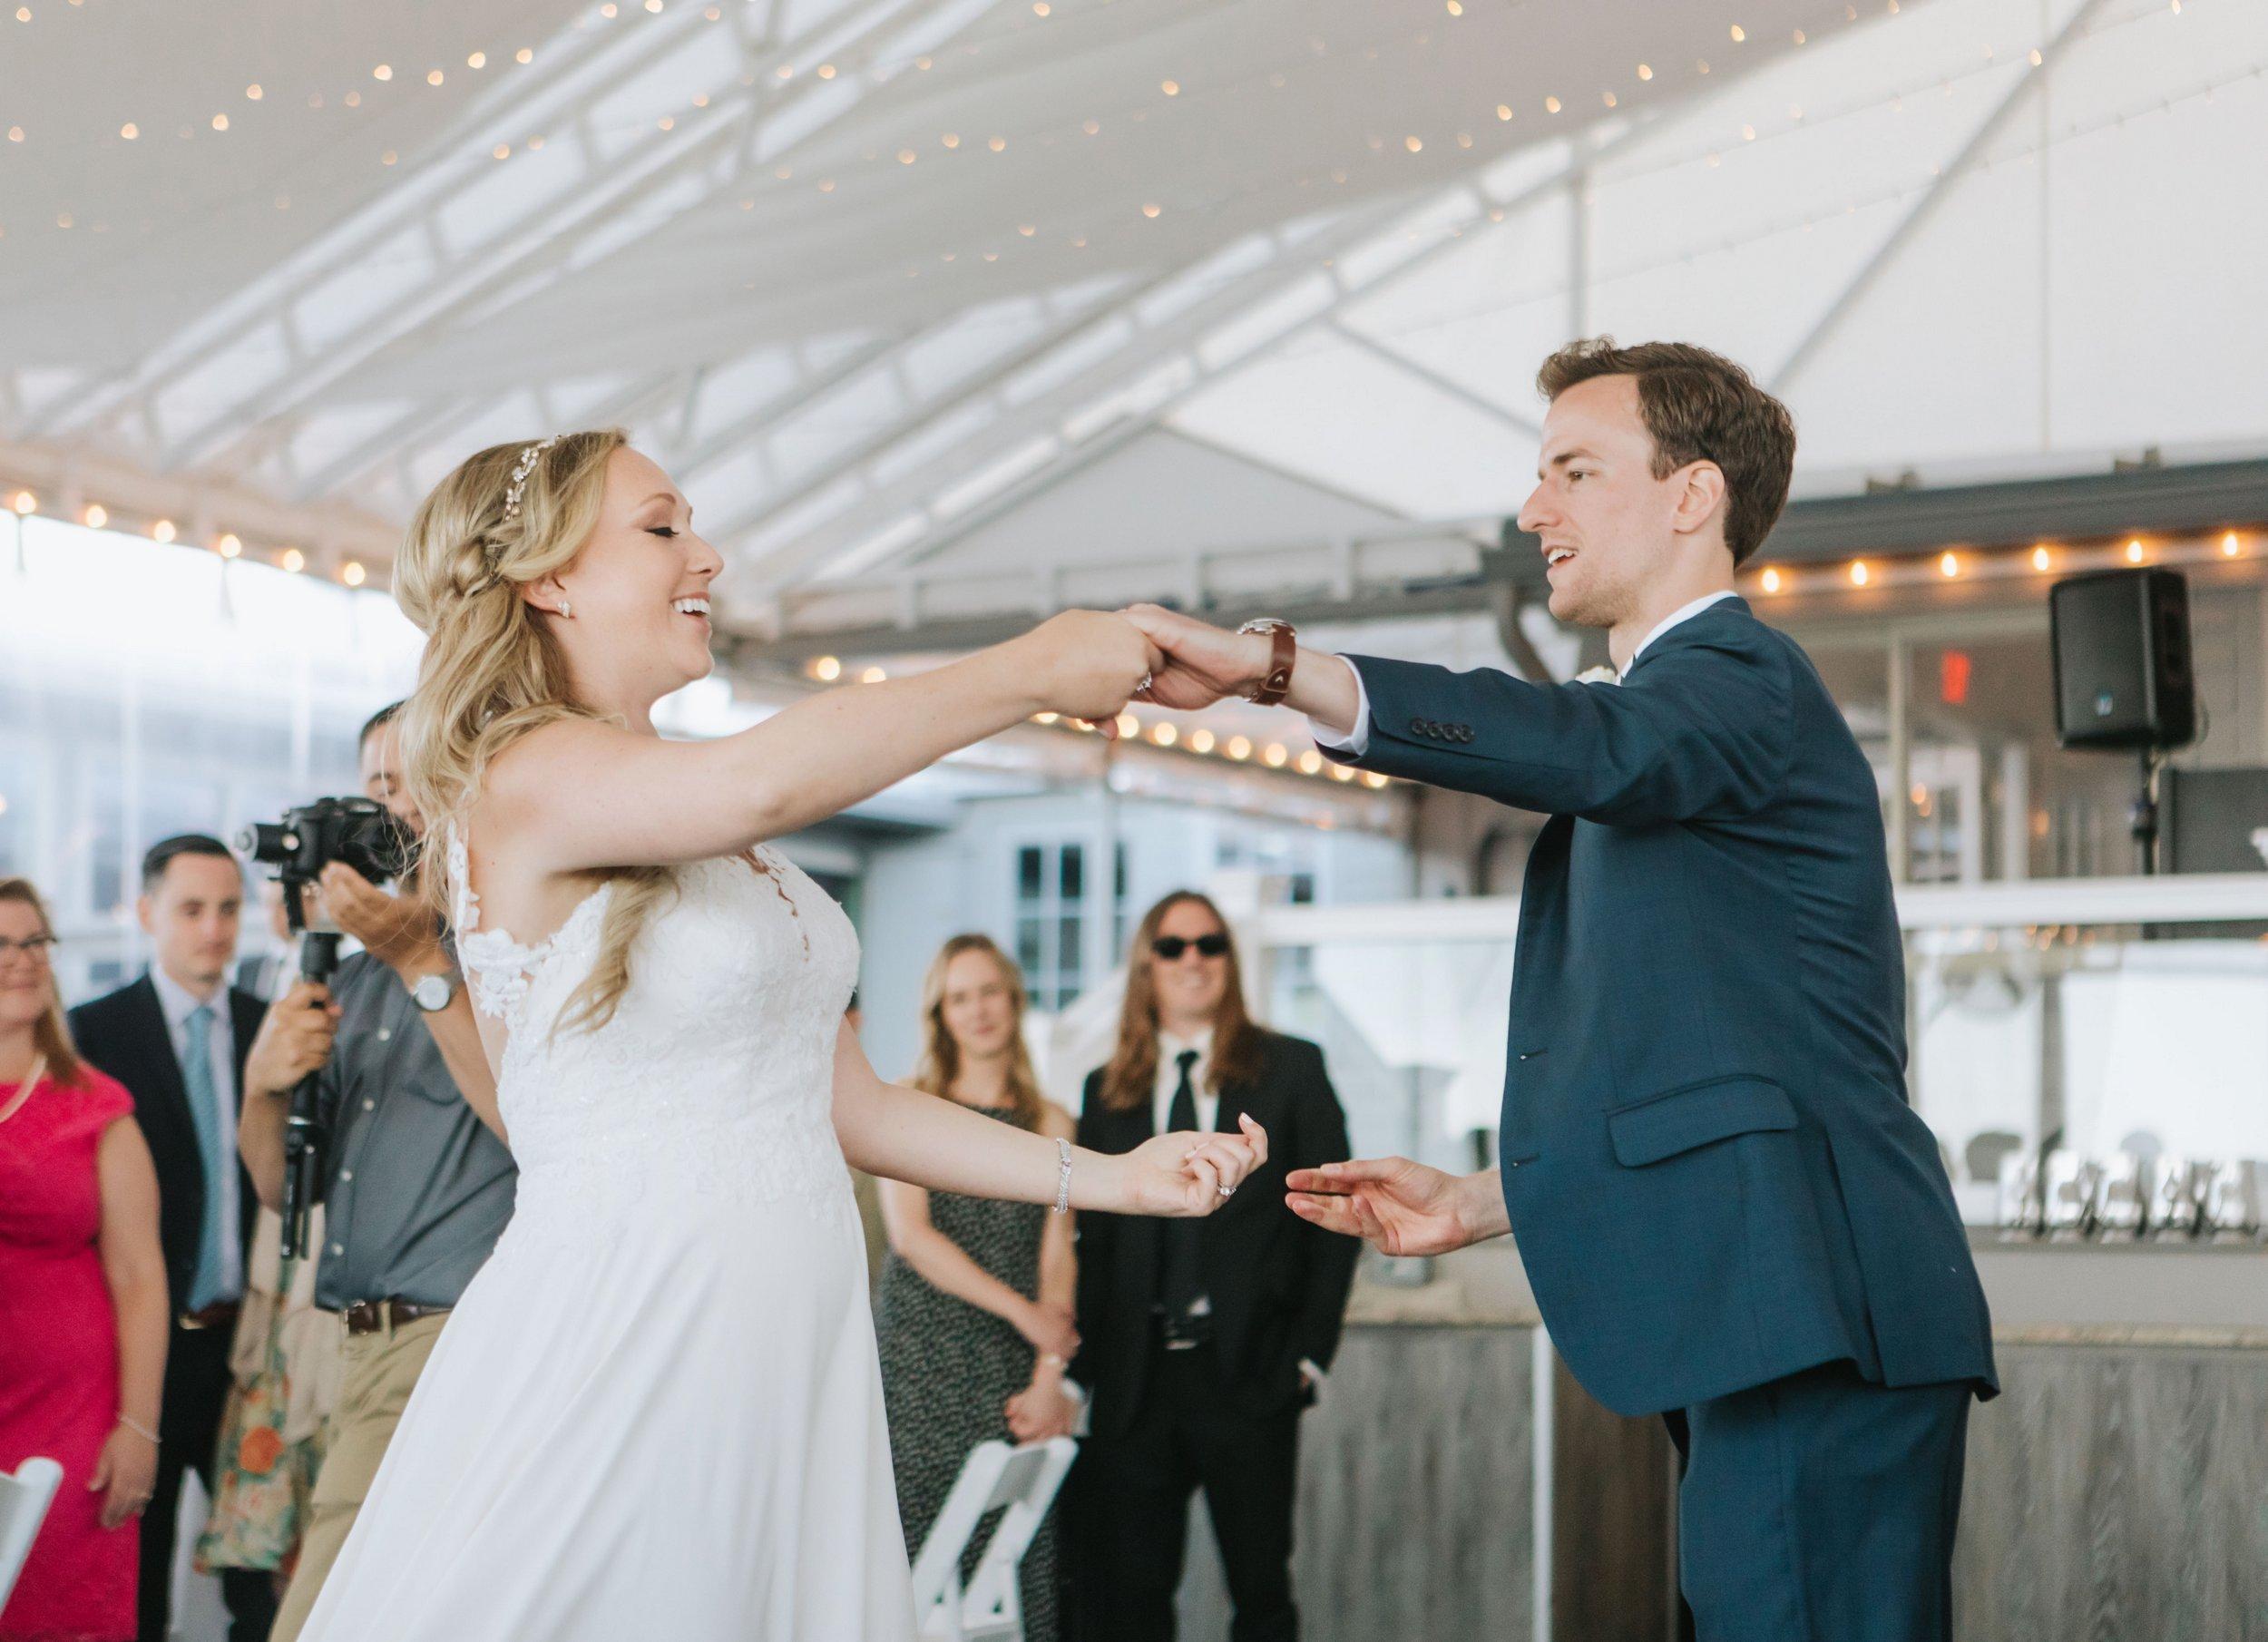 Popponesset-Inn-Wedding-Cape-Cod-Lena-Mirisola-Photography-43.jpg